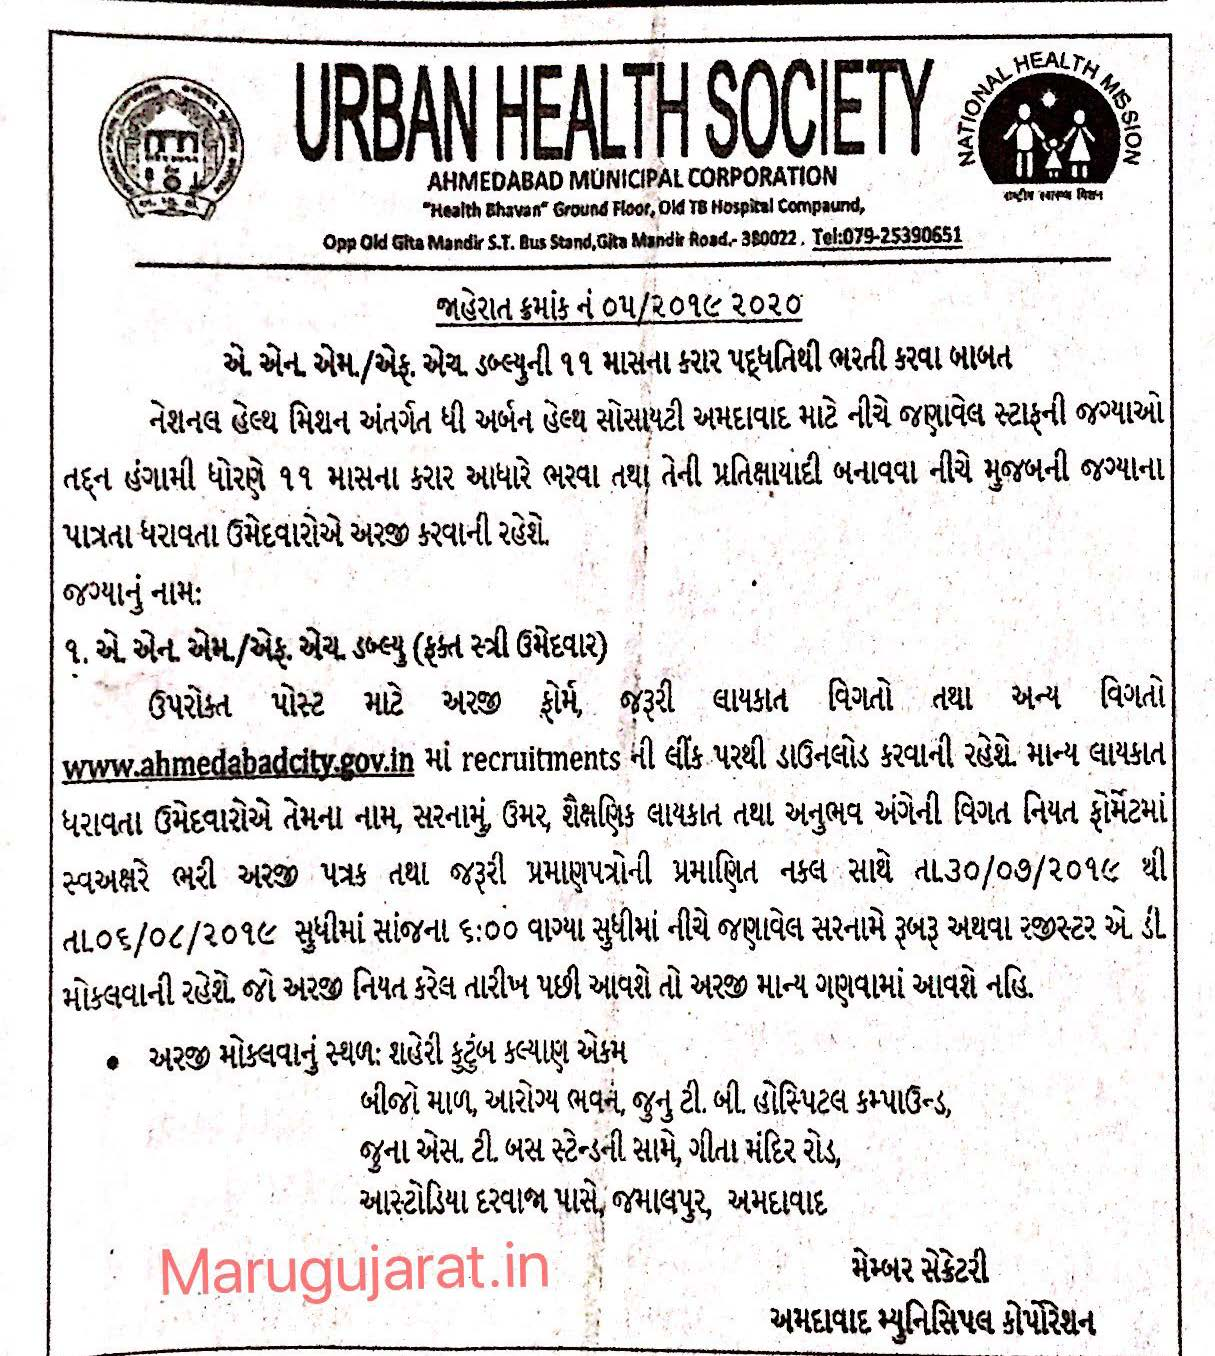 Urban Health Society Ahmedabad Recruitment for Staff Nurse